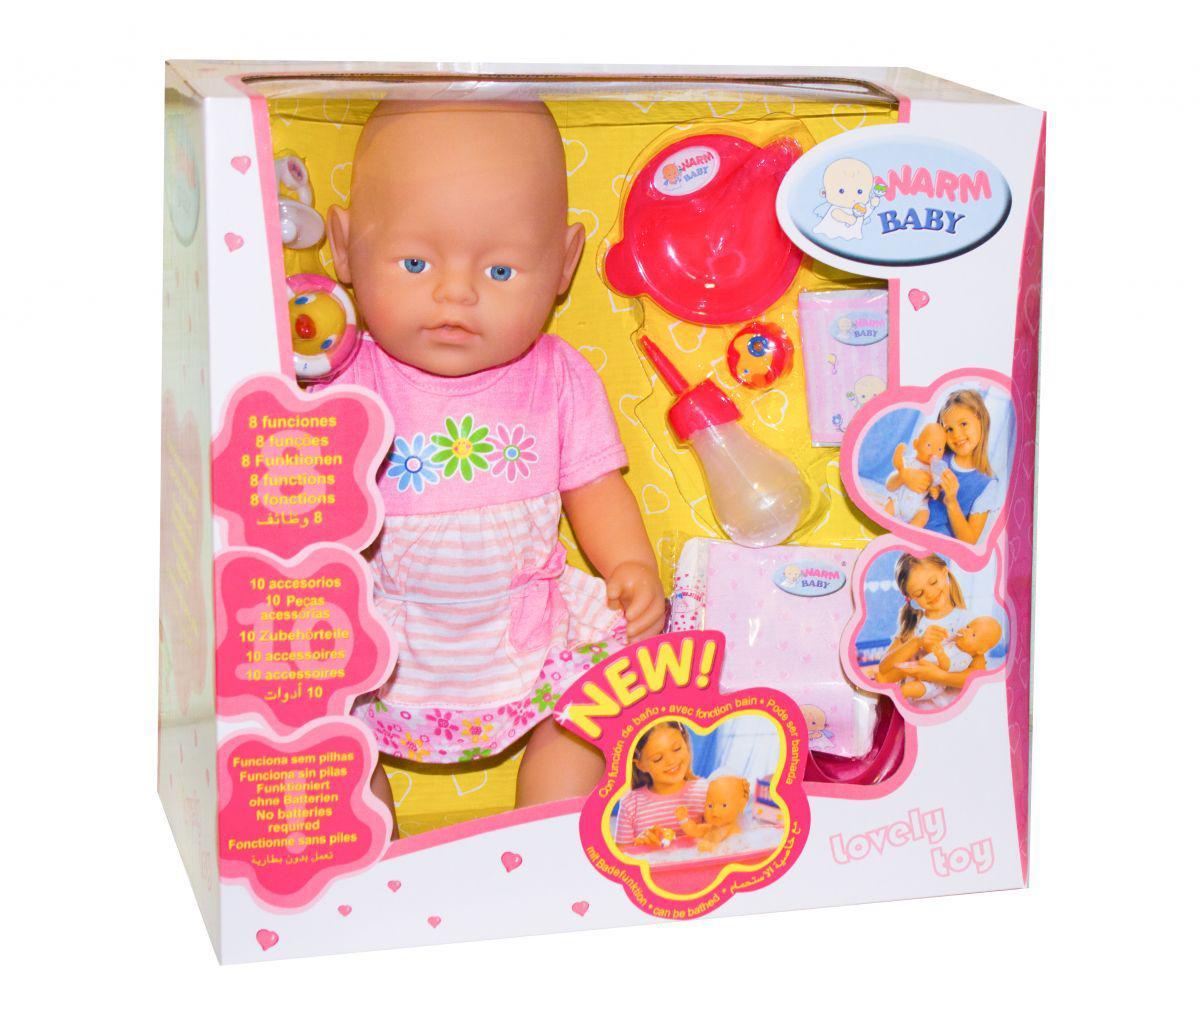 Пупс Baby Born 8 функций 10 аксессуаров 058-17